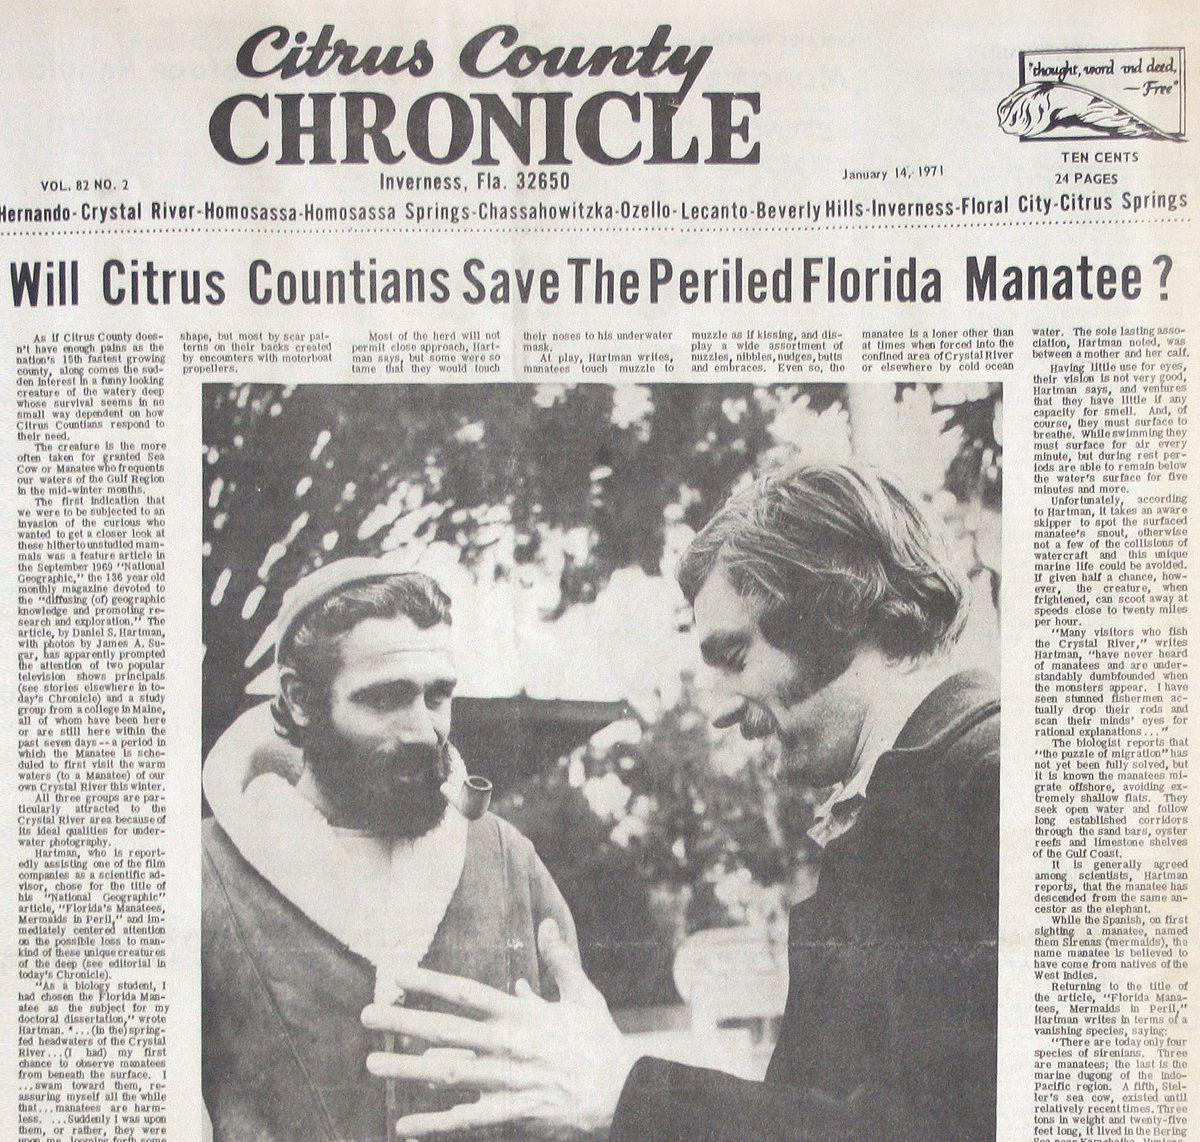 Citrus County Chronicle January 14, 1971